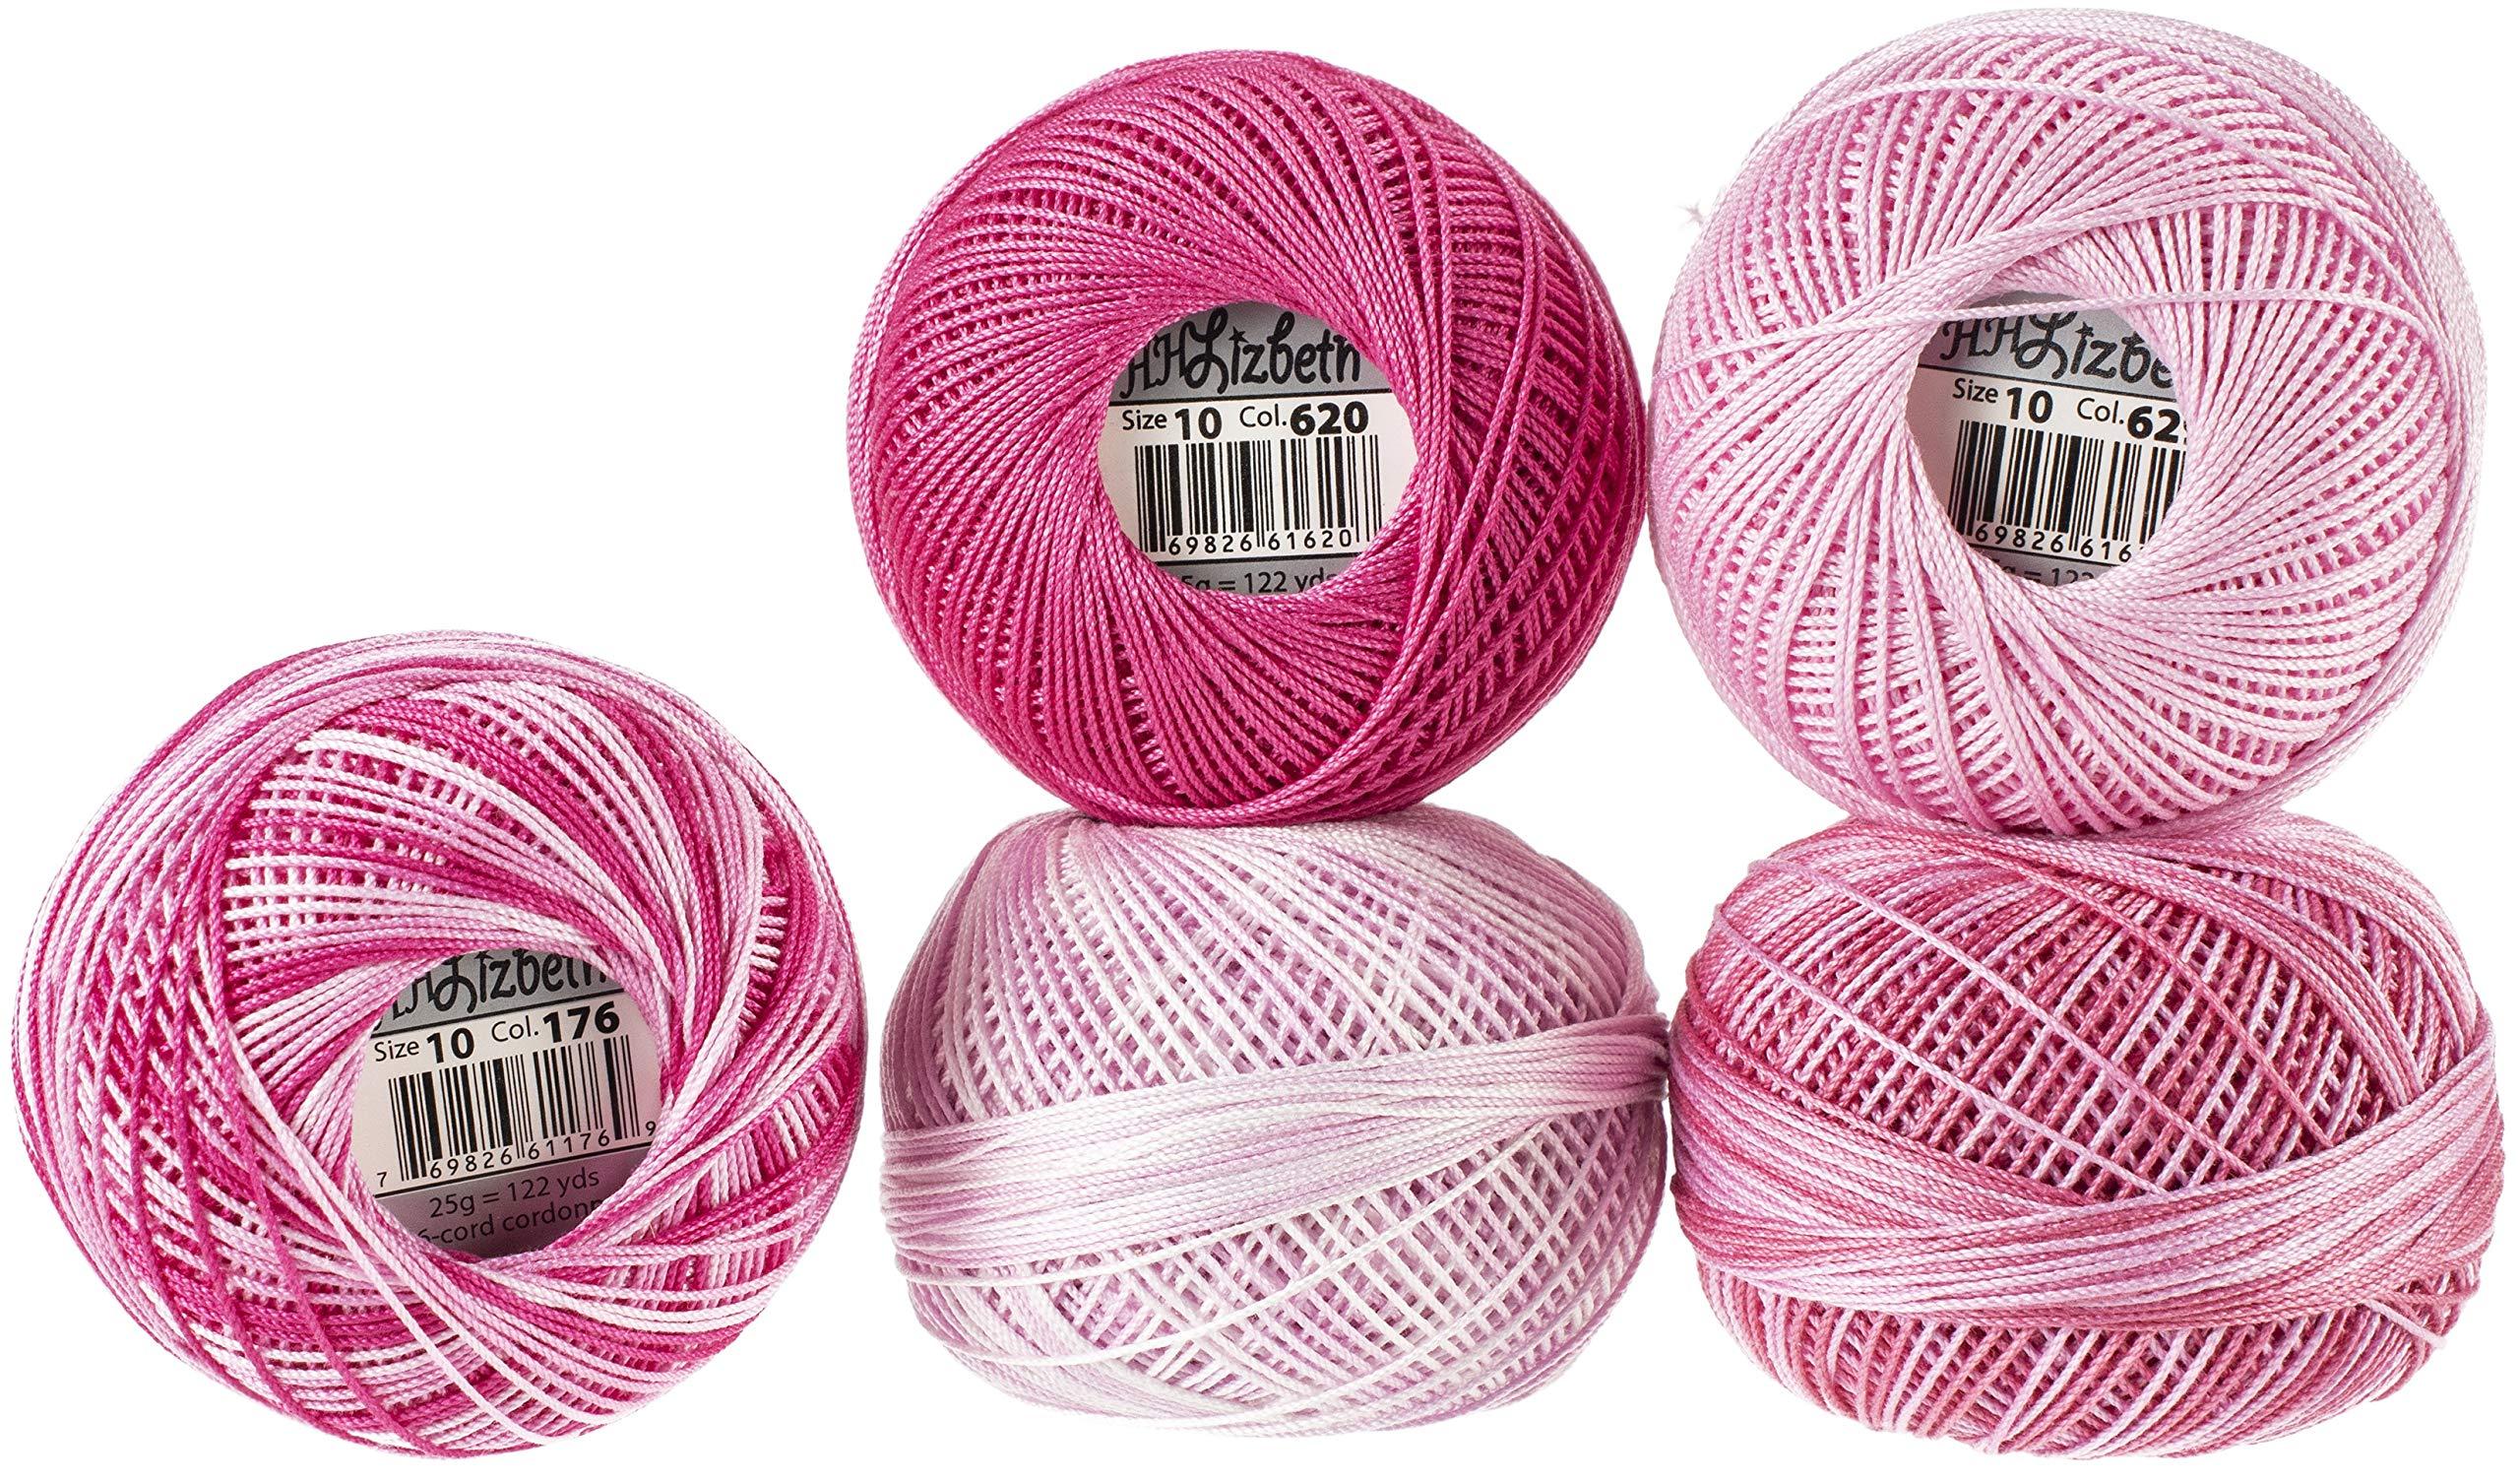 Handy Hands Lizbeth Specialty Pack Cordonnet Cotton Size 10-Ballerina 5/Pkg